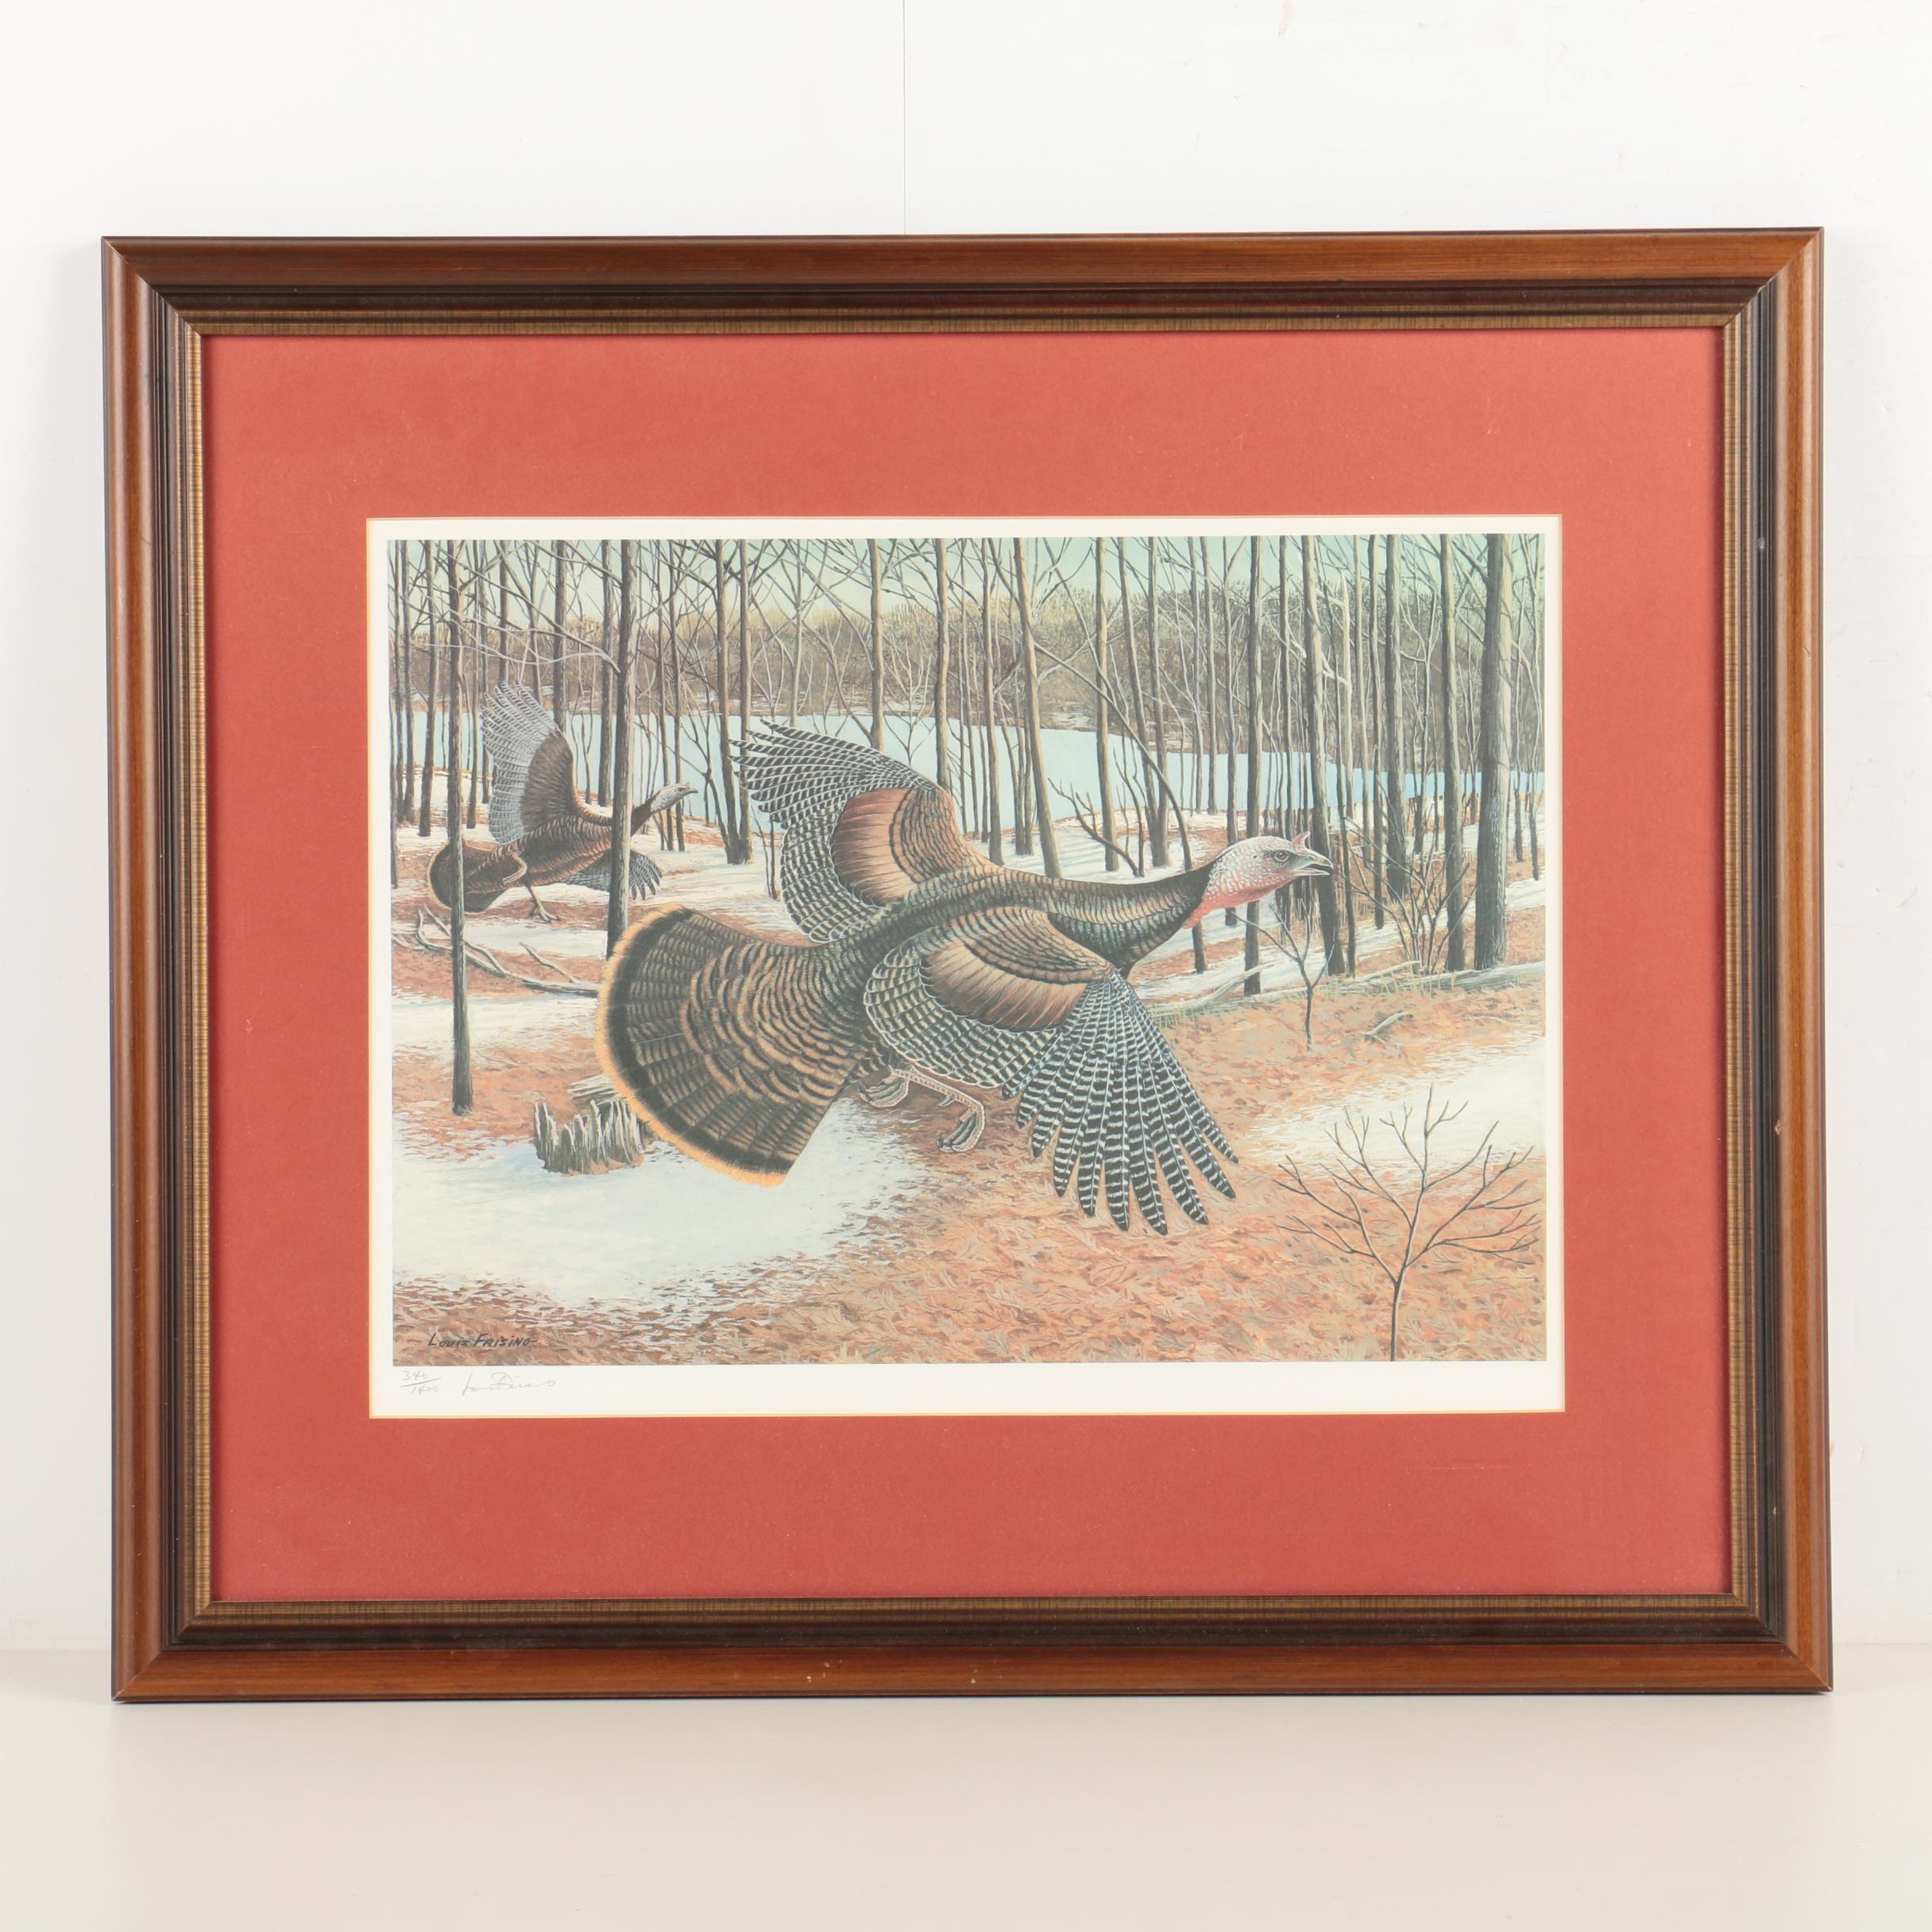 Louis Frisino Limited Edition Reproduction Print of Wild Turkeys